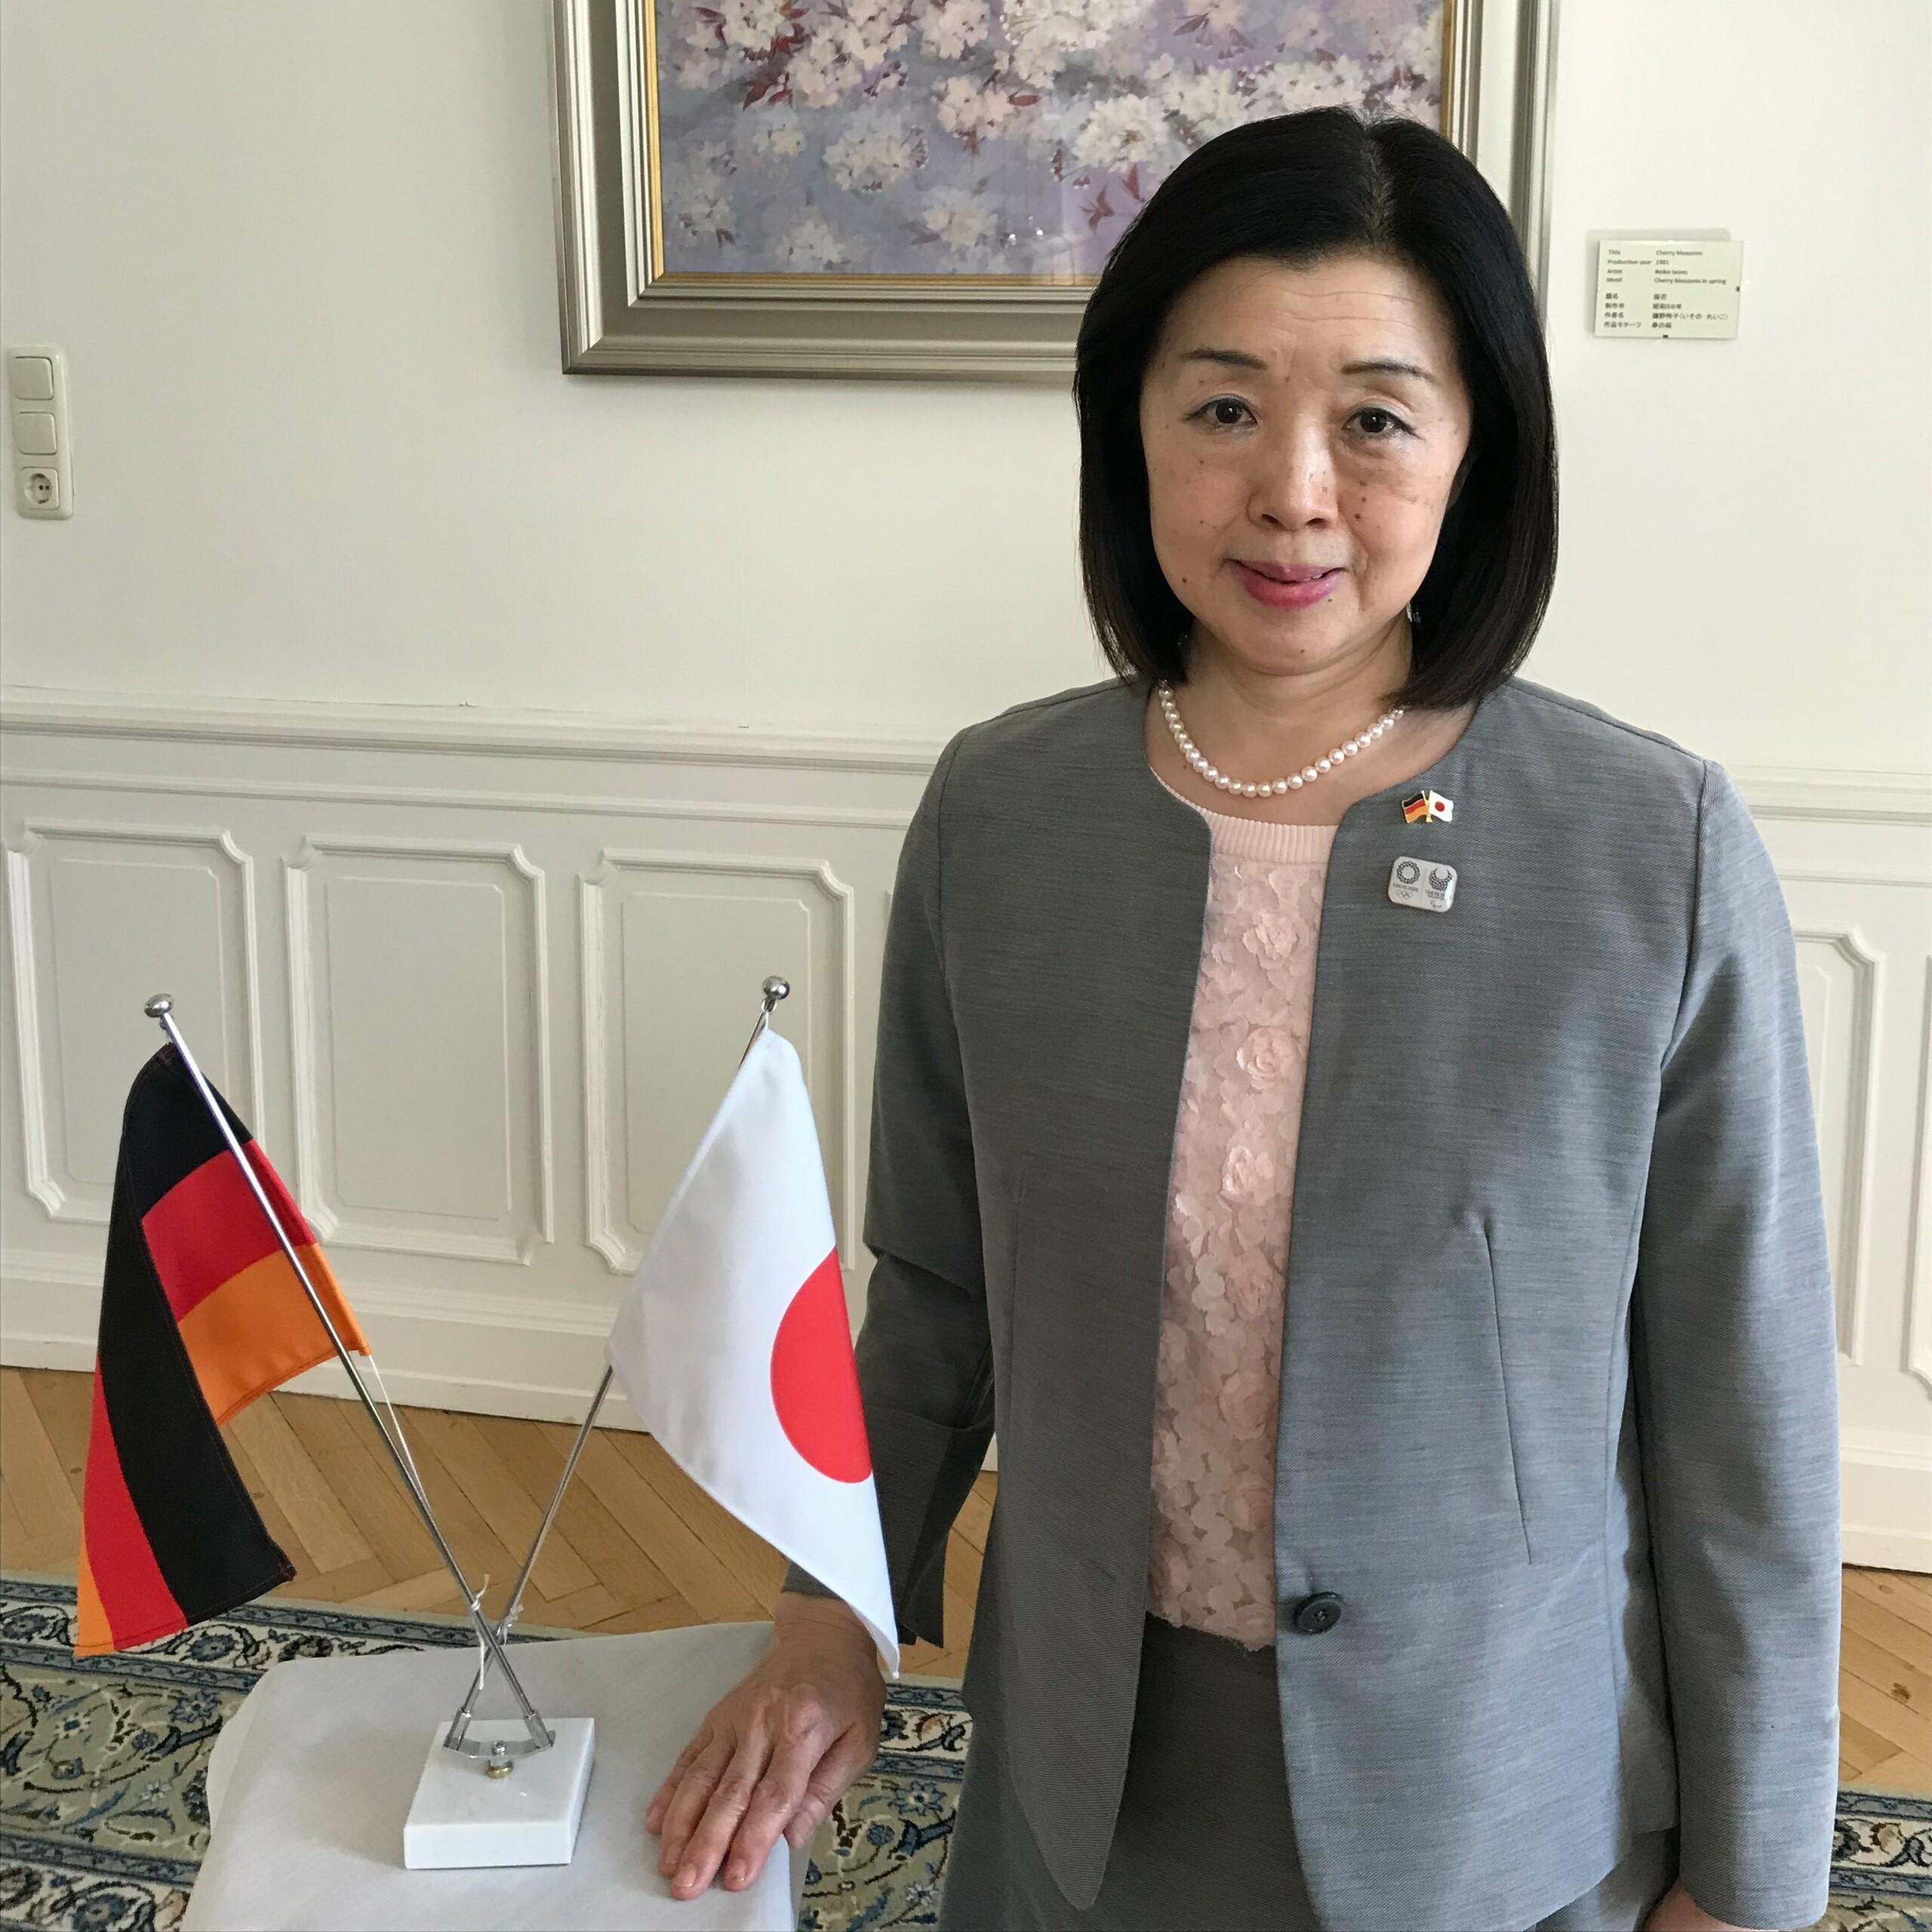 Generalkonsulin Kato